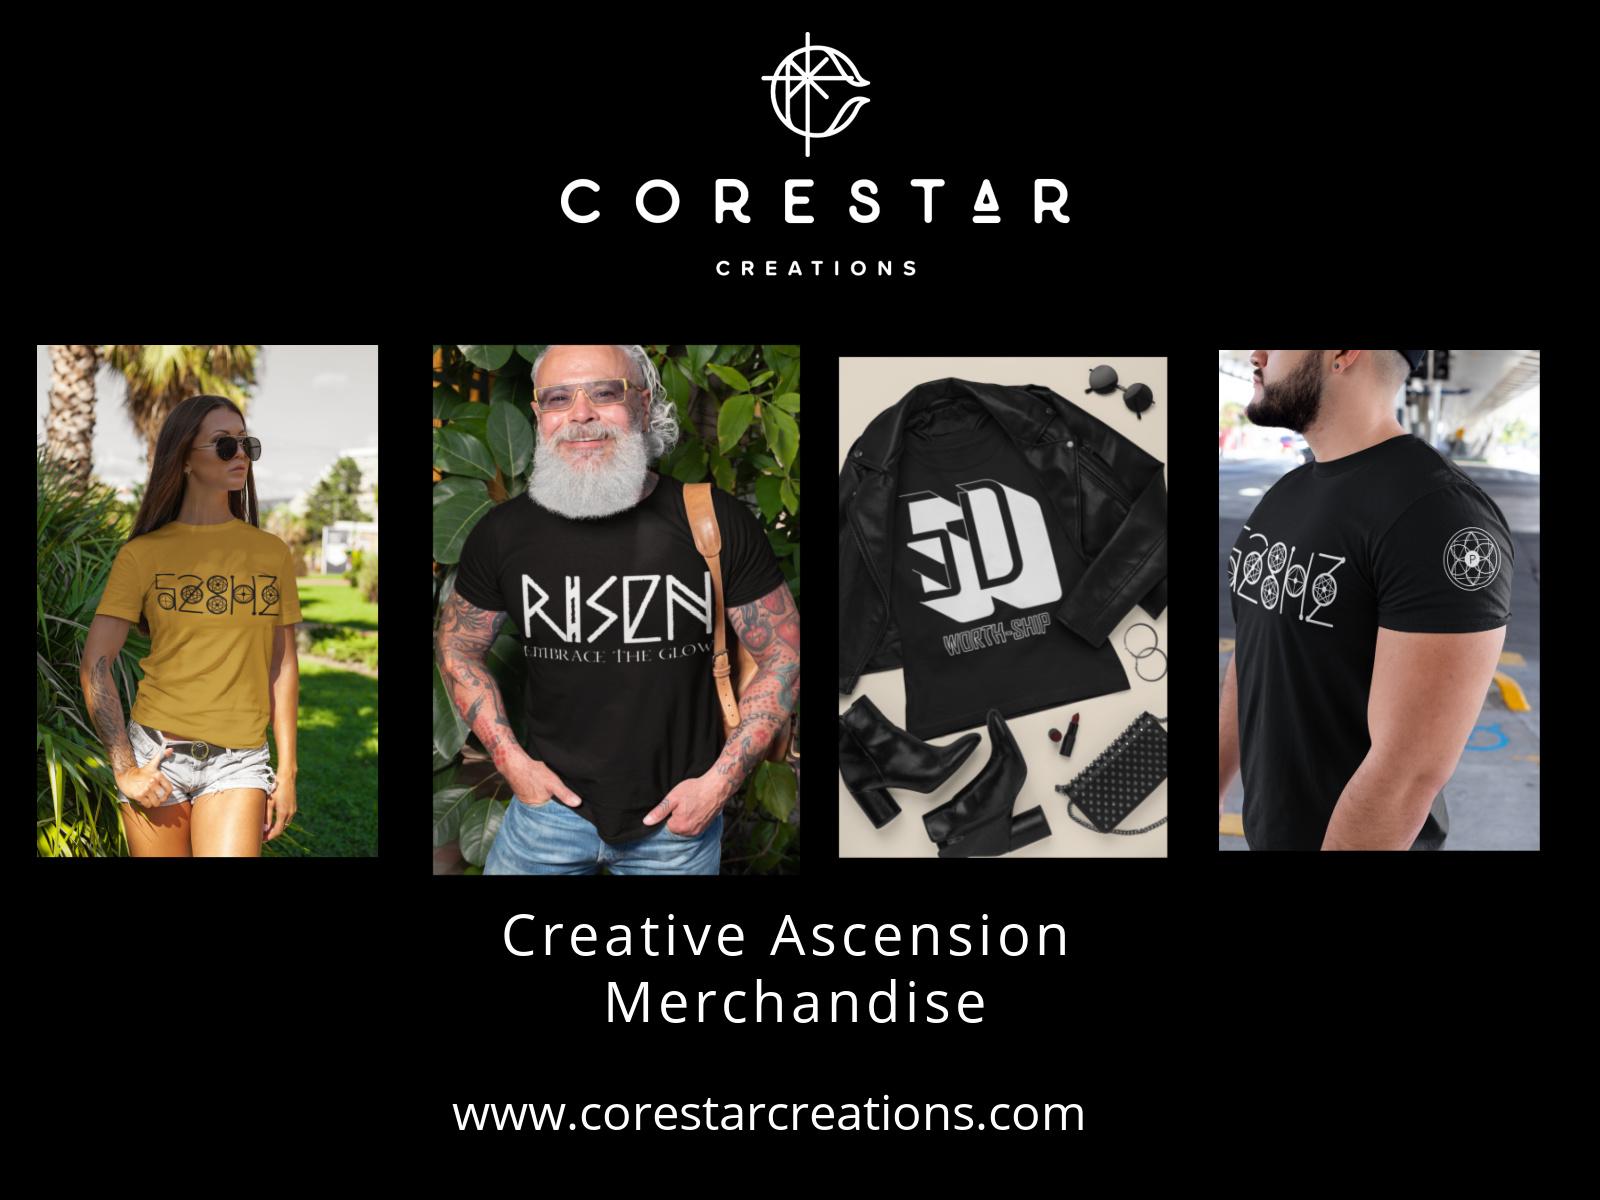 Corestar Creations